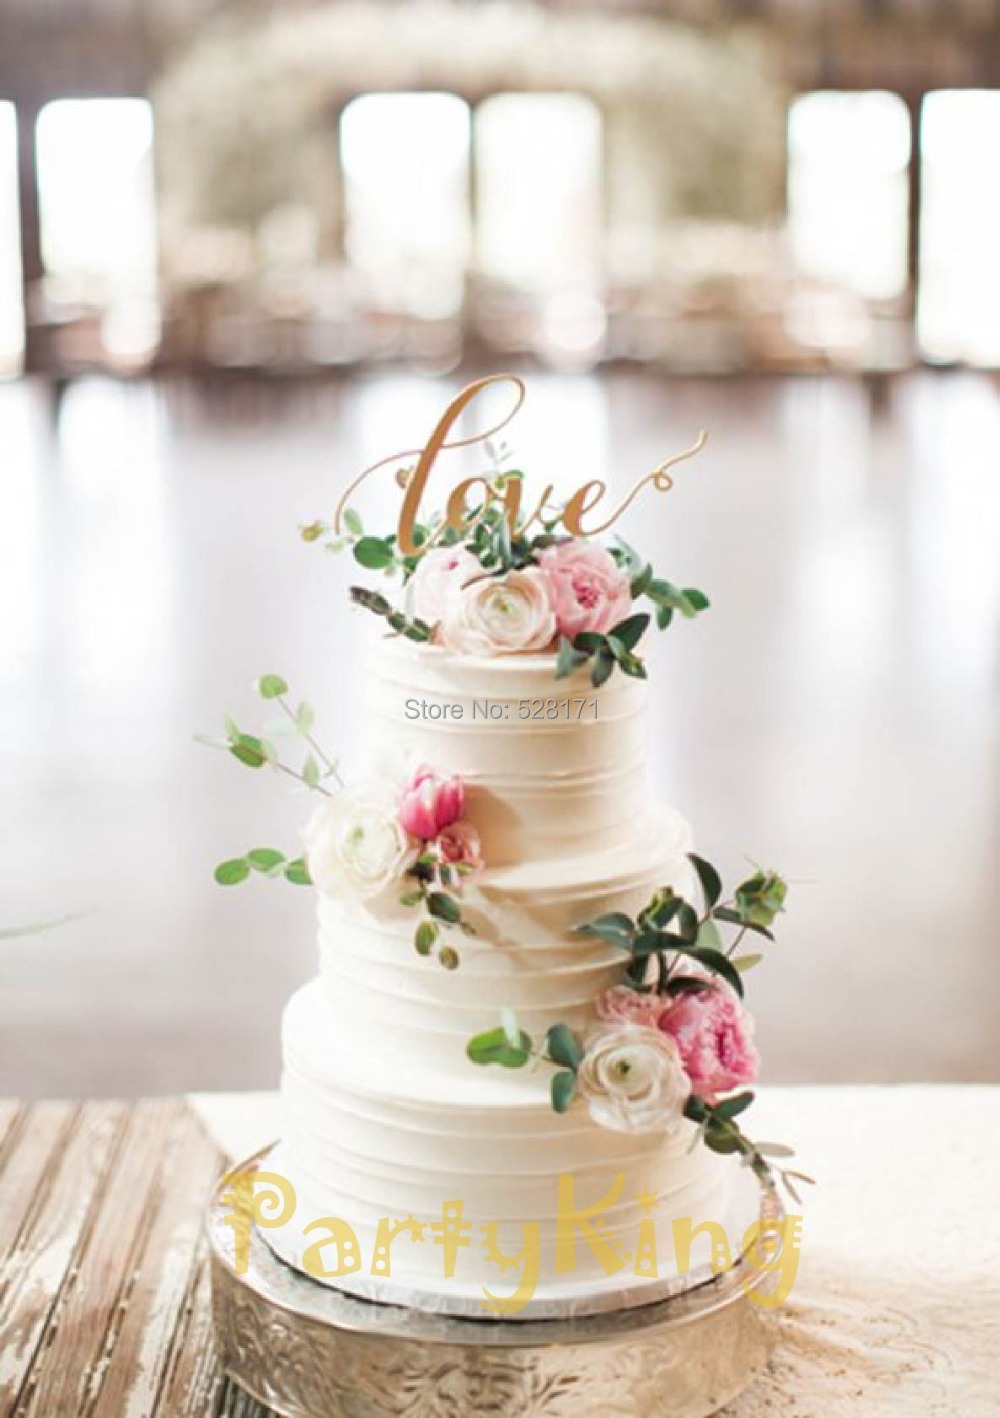 Radiant Love Cake Personalized Wedding Cake Bing G Wedding Cake Wedding Cake Pers Ny Amazon Wedding Cake Pers